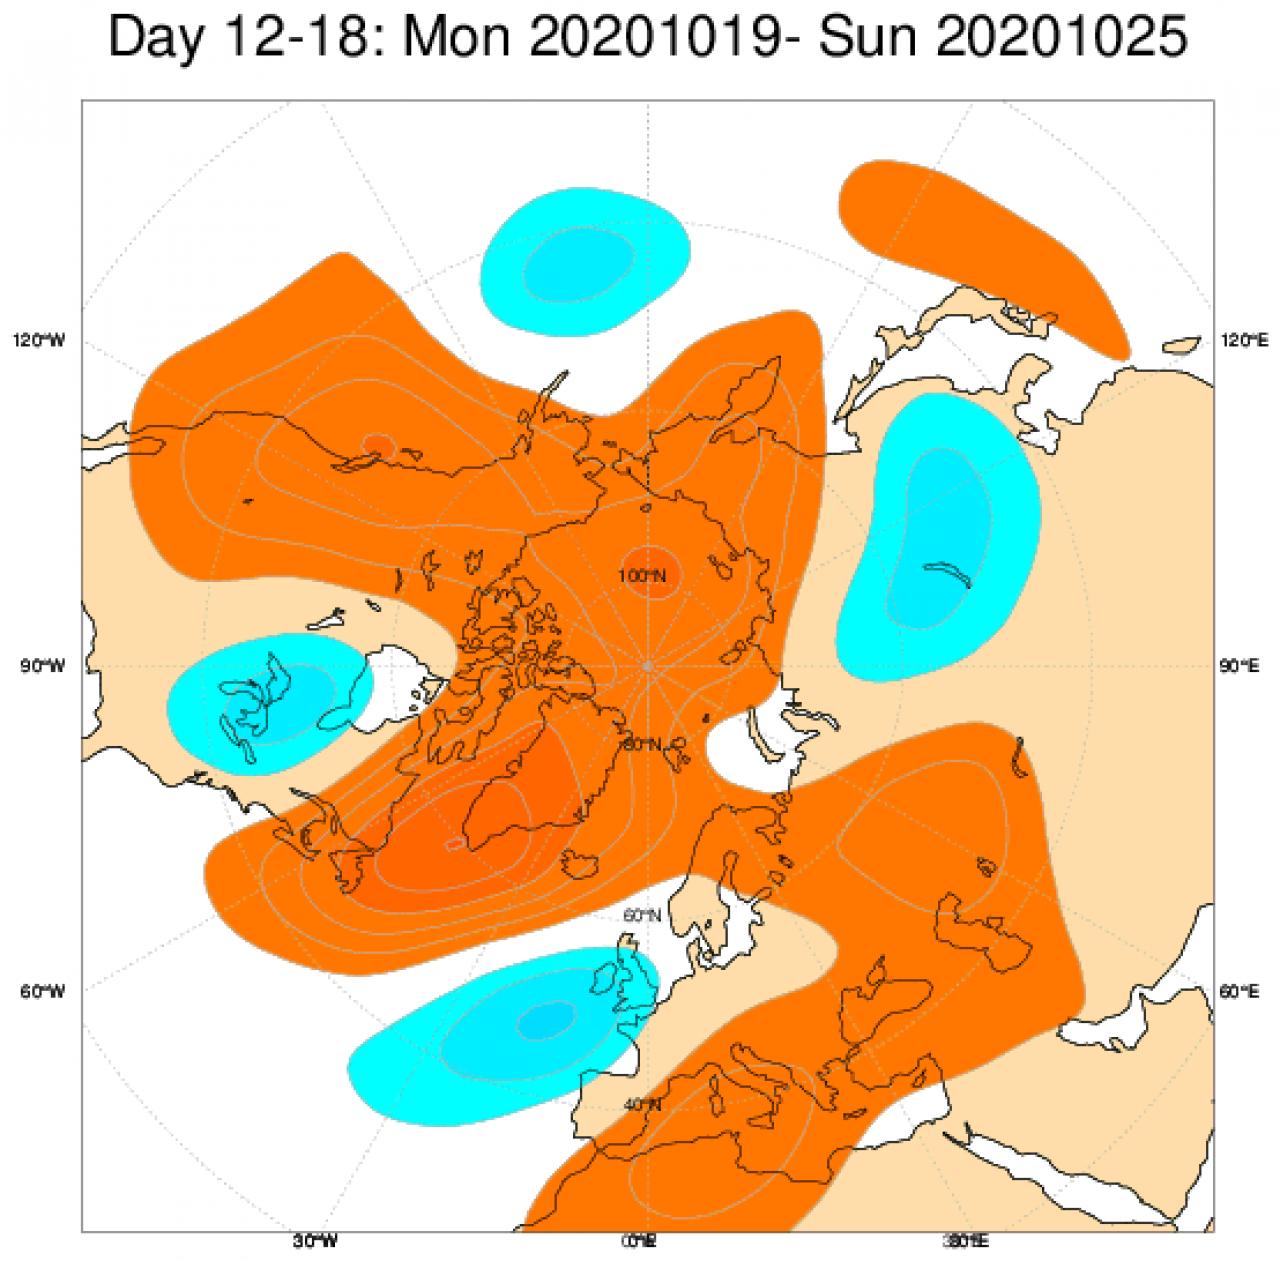 anomalie a 500 hpa 19-25 ottobre secondo Ecmwf